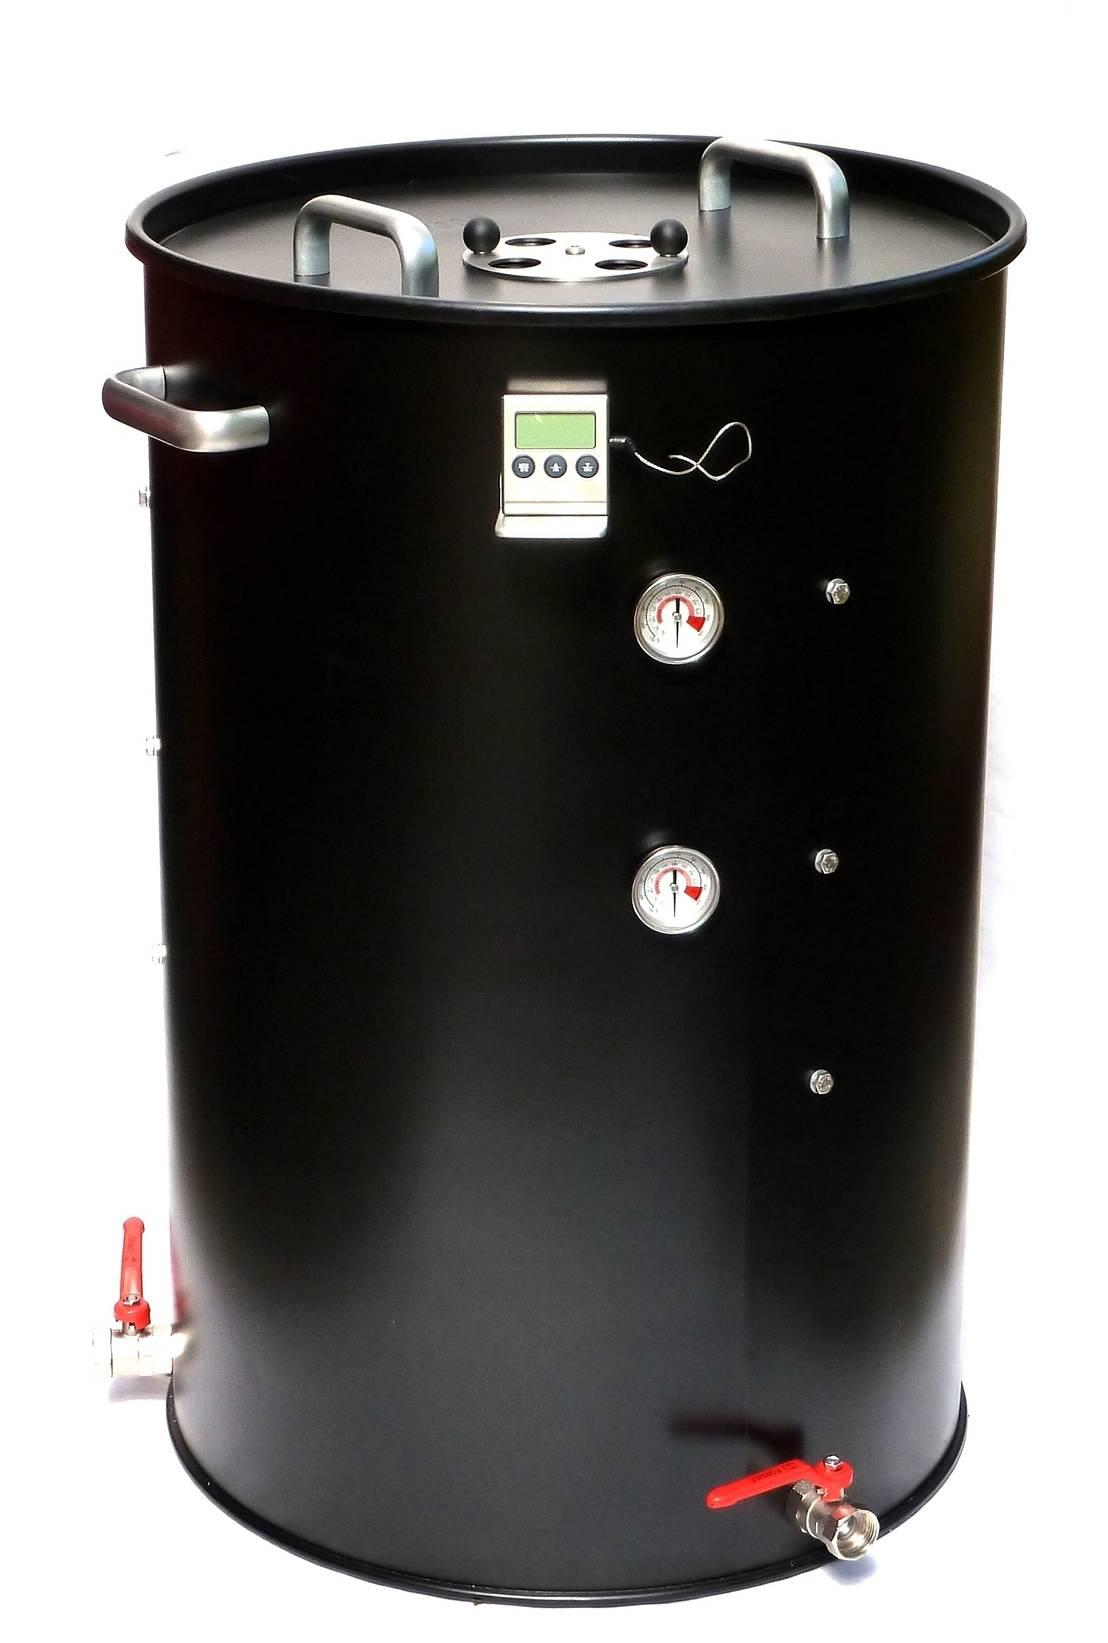 smoker im uds design bbq grill de hermann maschinenbau gmbh homify. Black Bedroom Furniture Sets. Home Design Ideas